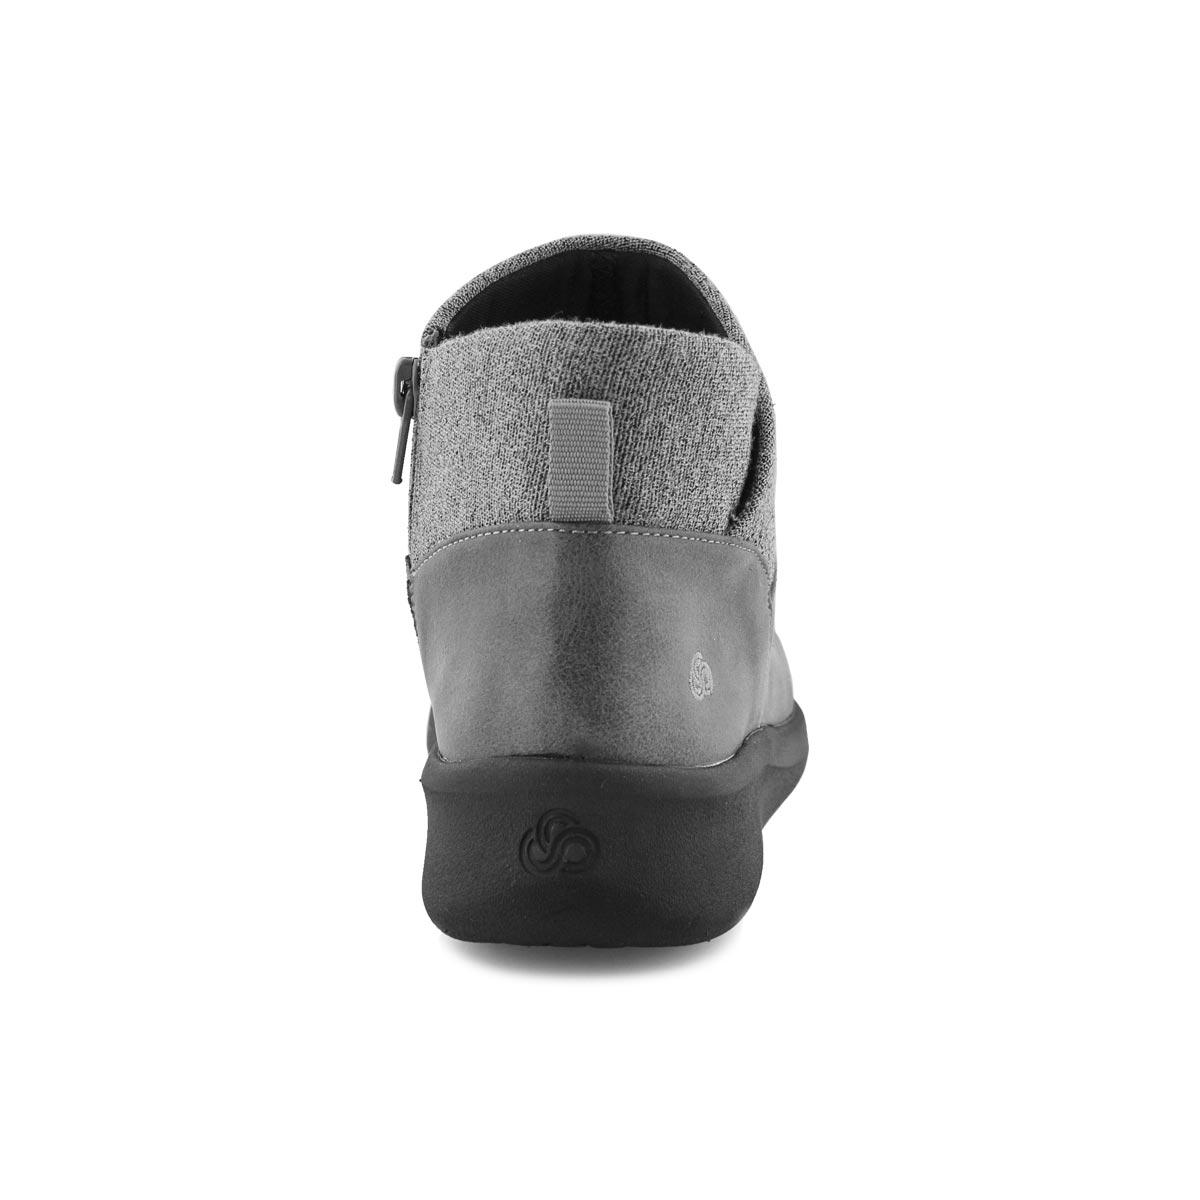 Lds Sillian 2.0 Dusk grey slip on boot